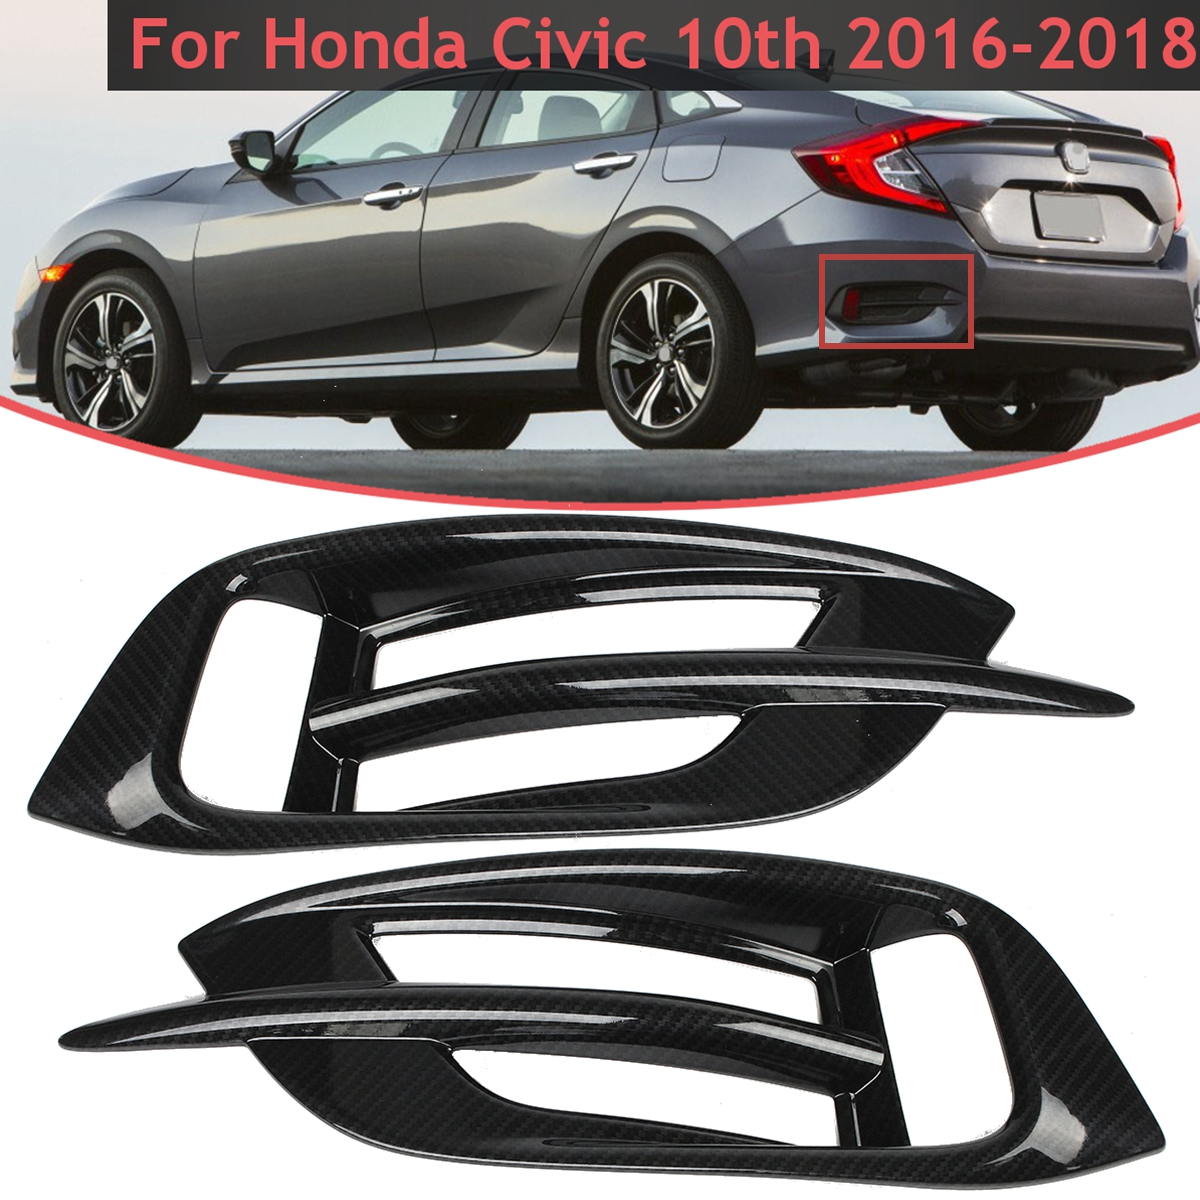 Aliexpress.com : Buy 1 Pair ABS Carbon Style Rear Bumper